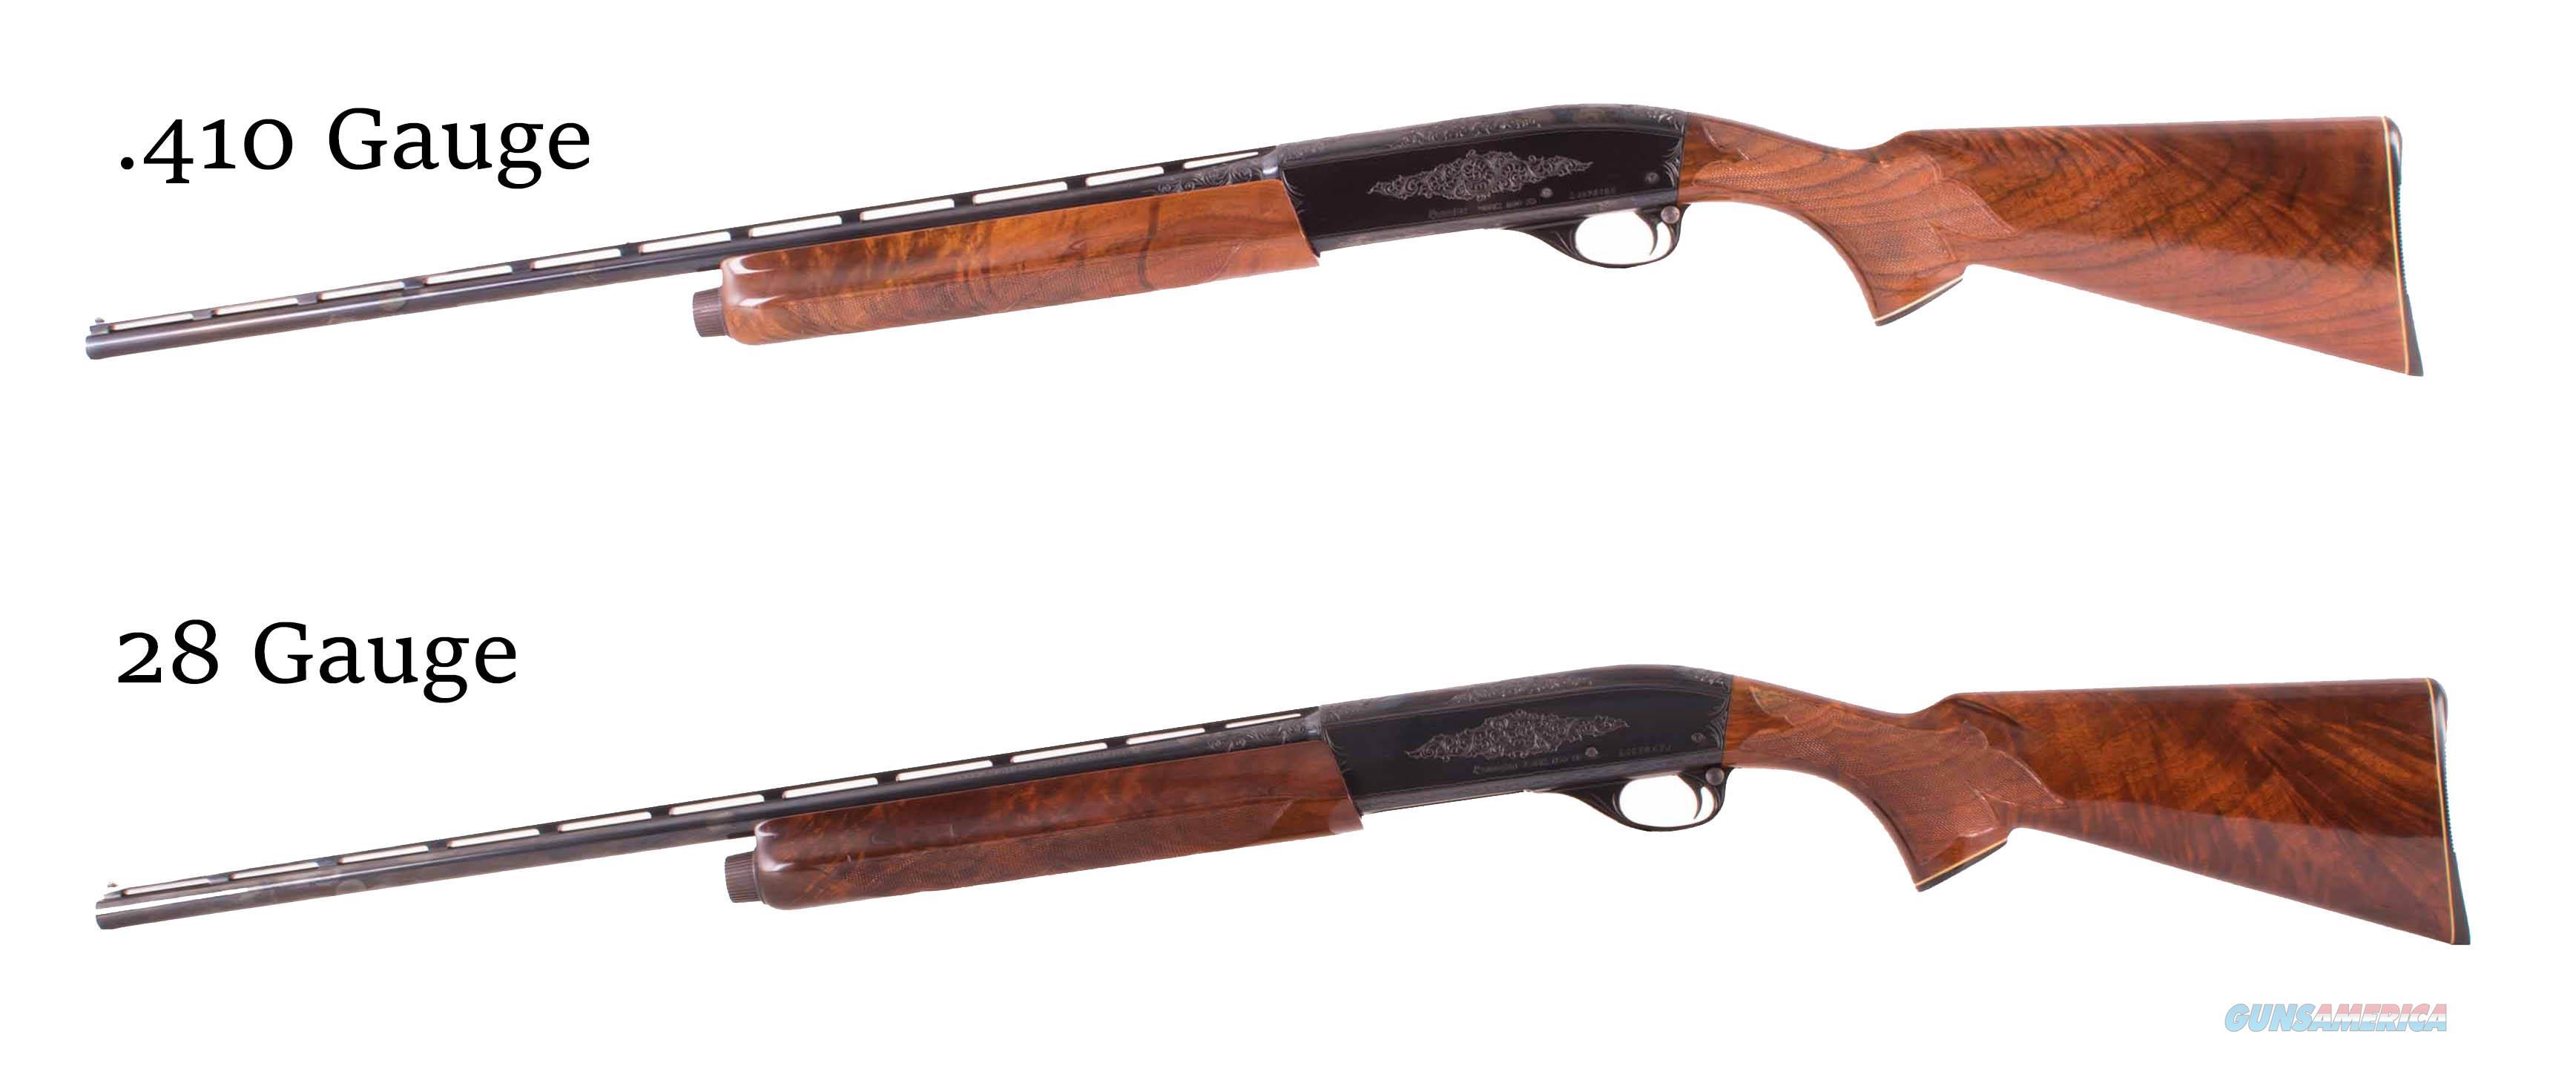 Remington Model 1100 - D GRADE, CONSECUTIVELY NUMBERED PAIR, .410, 28 GAUGE, AS NEW, vintage firearms inc  Guns > Shotguns > Remington Shotguns  > Single Barrel